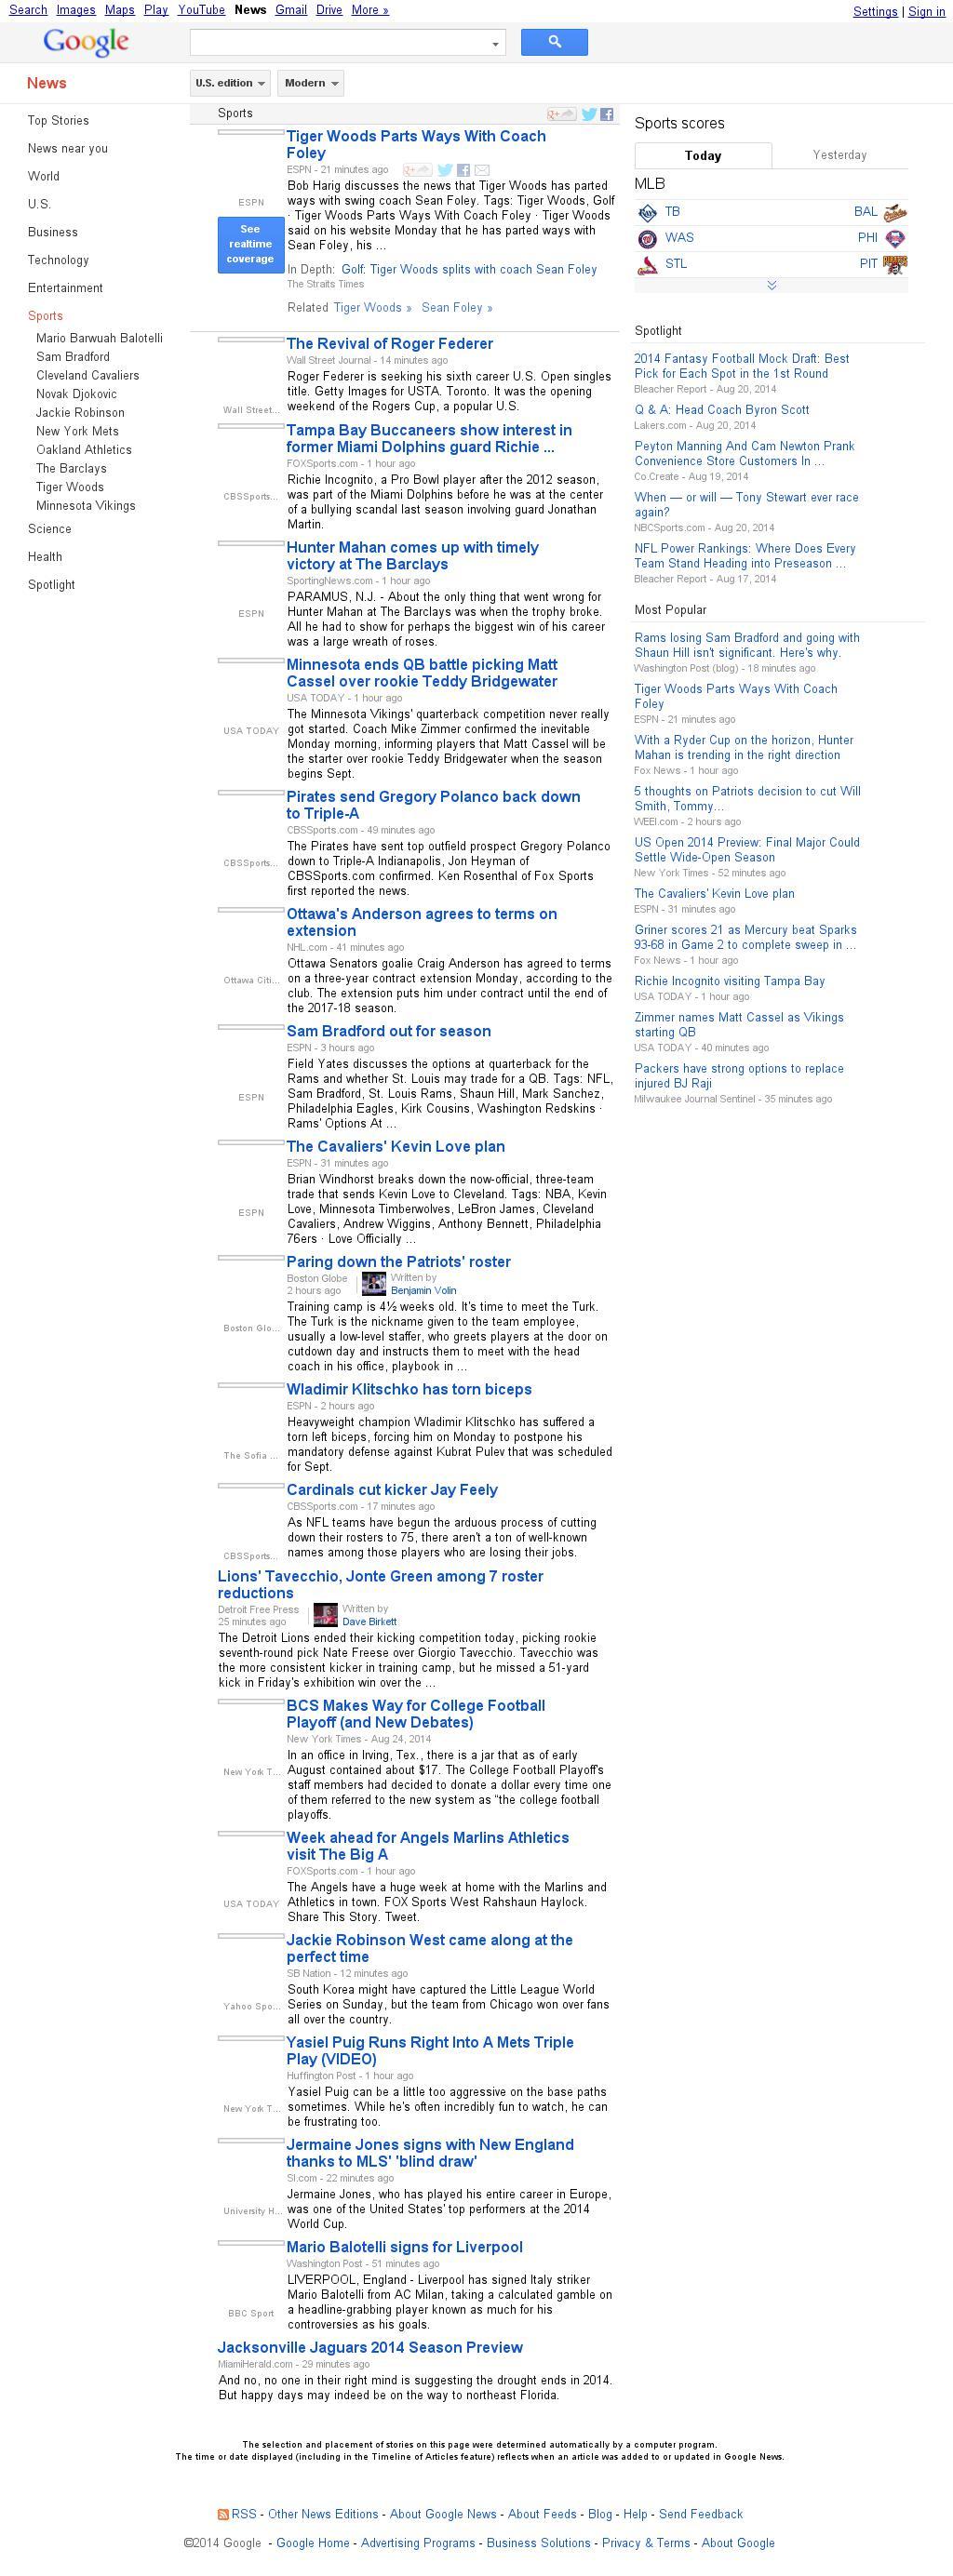 Google News: Sports at Monday Aug. 25, 2014, 5:09 p.m. UTC